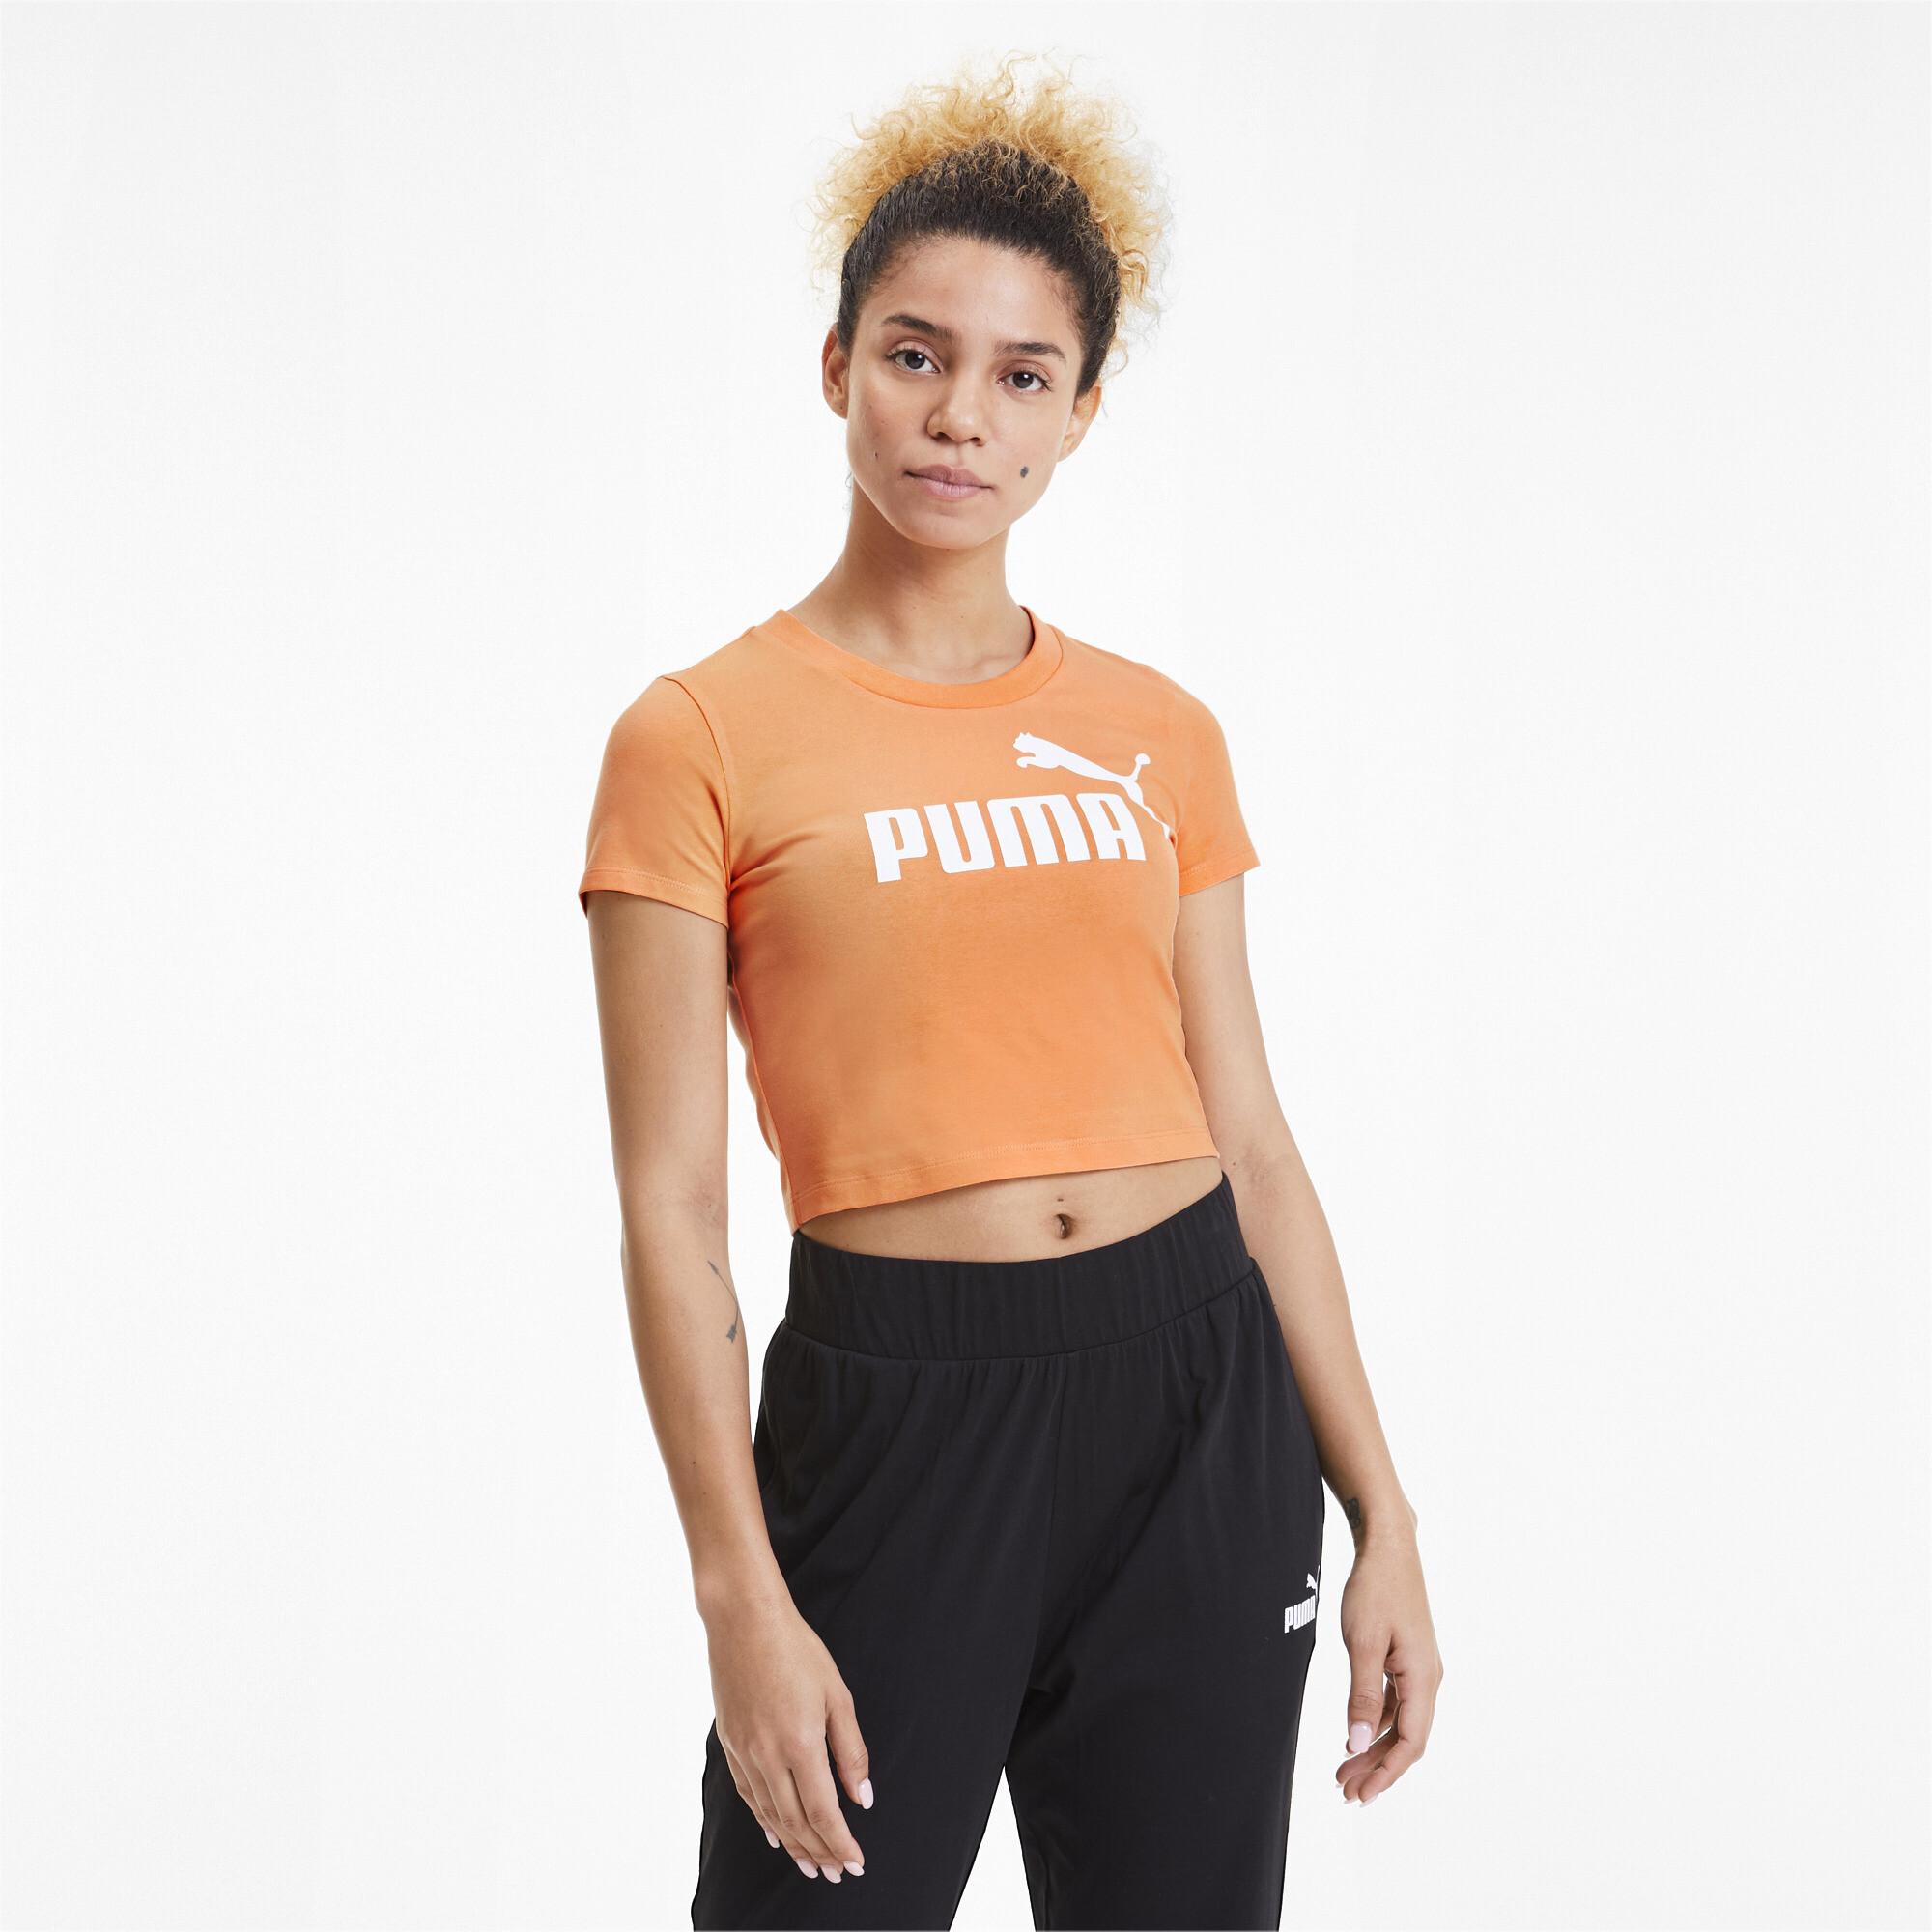 PUMA-Essentials-Women-039-s-Fitted-Tee-Women-Tee-Basics thumbnail 4